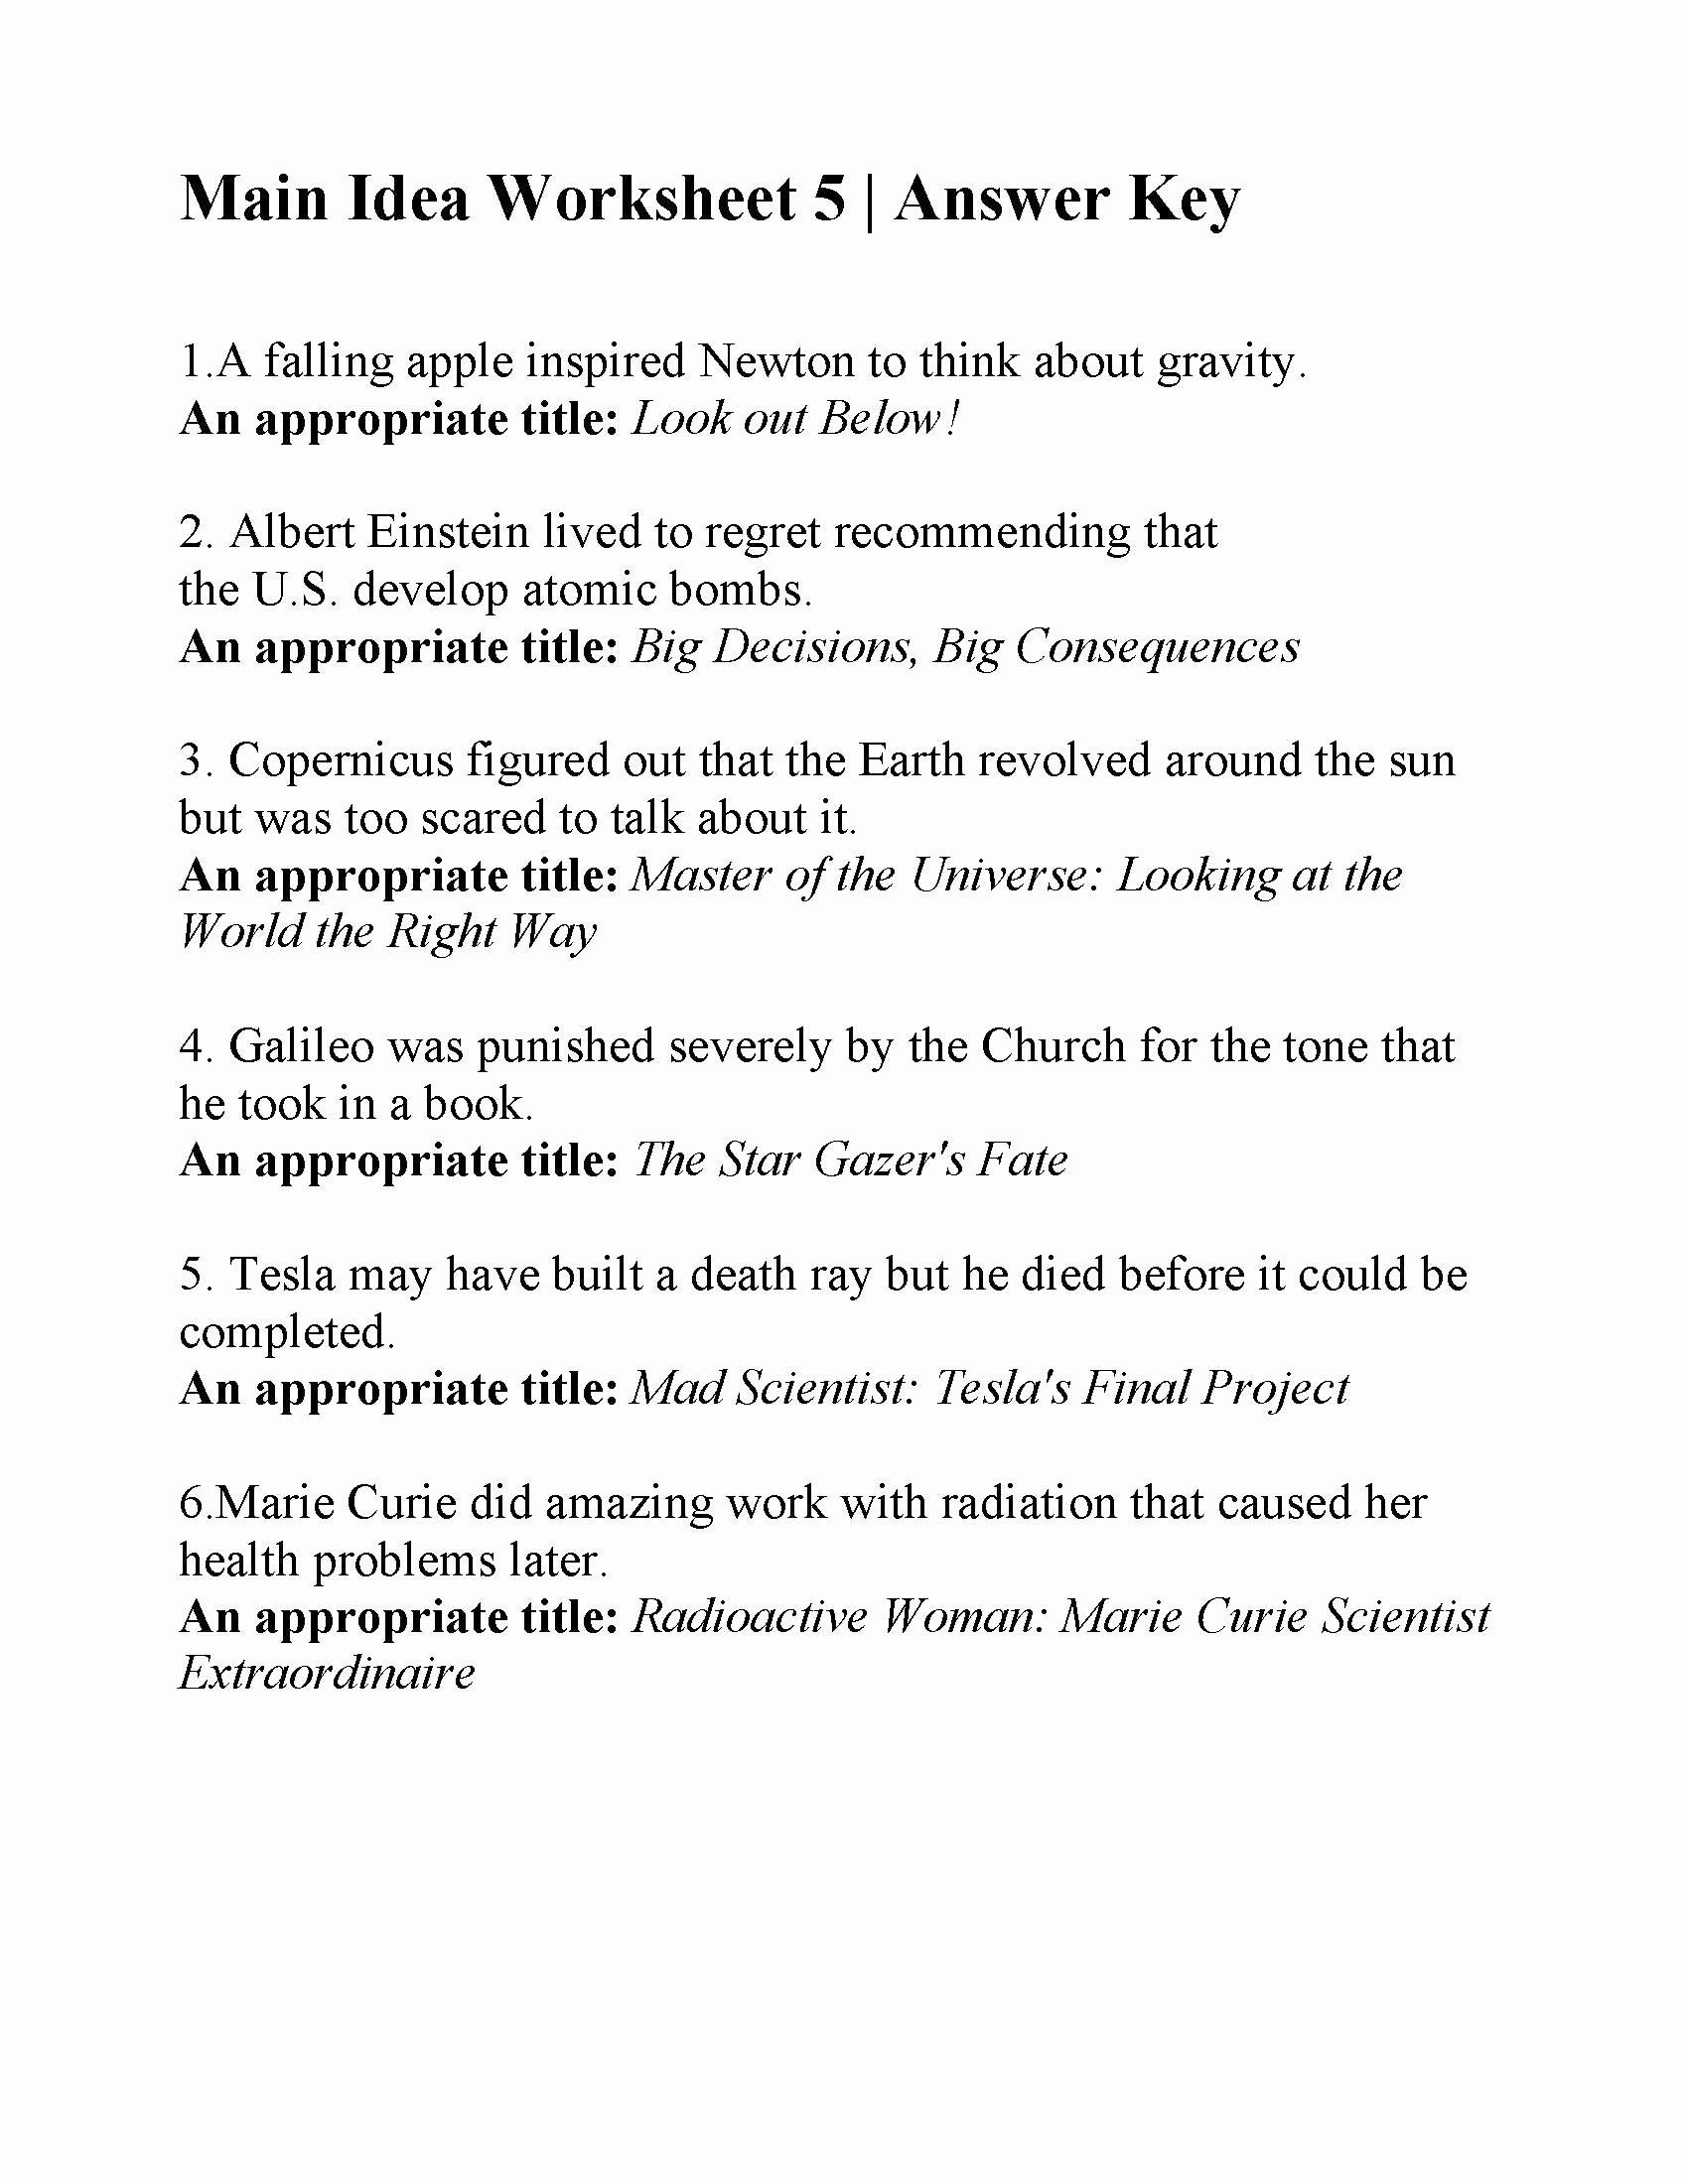 Main Idea Worksheet 5 Luxury Main Idea Worksheet 5